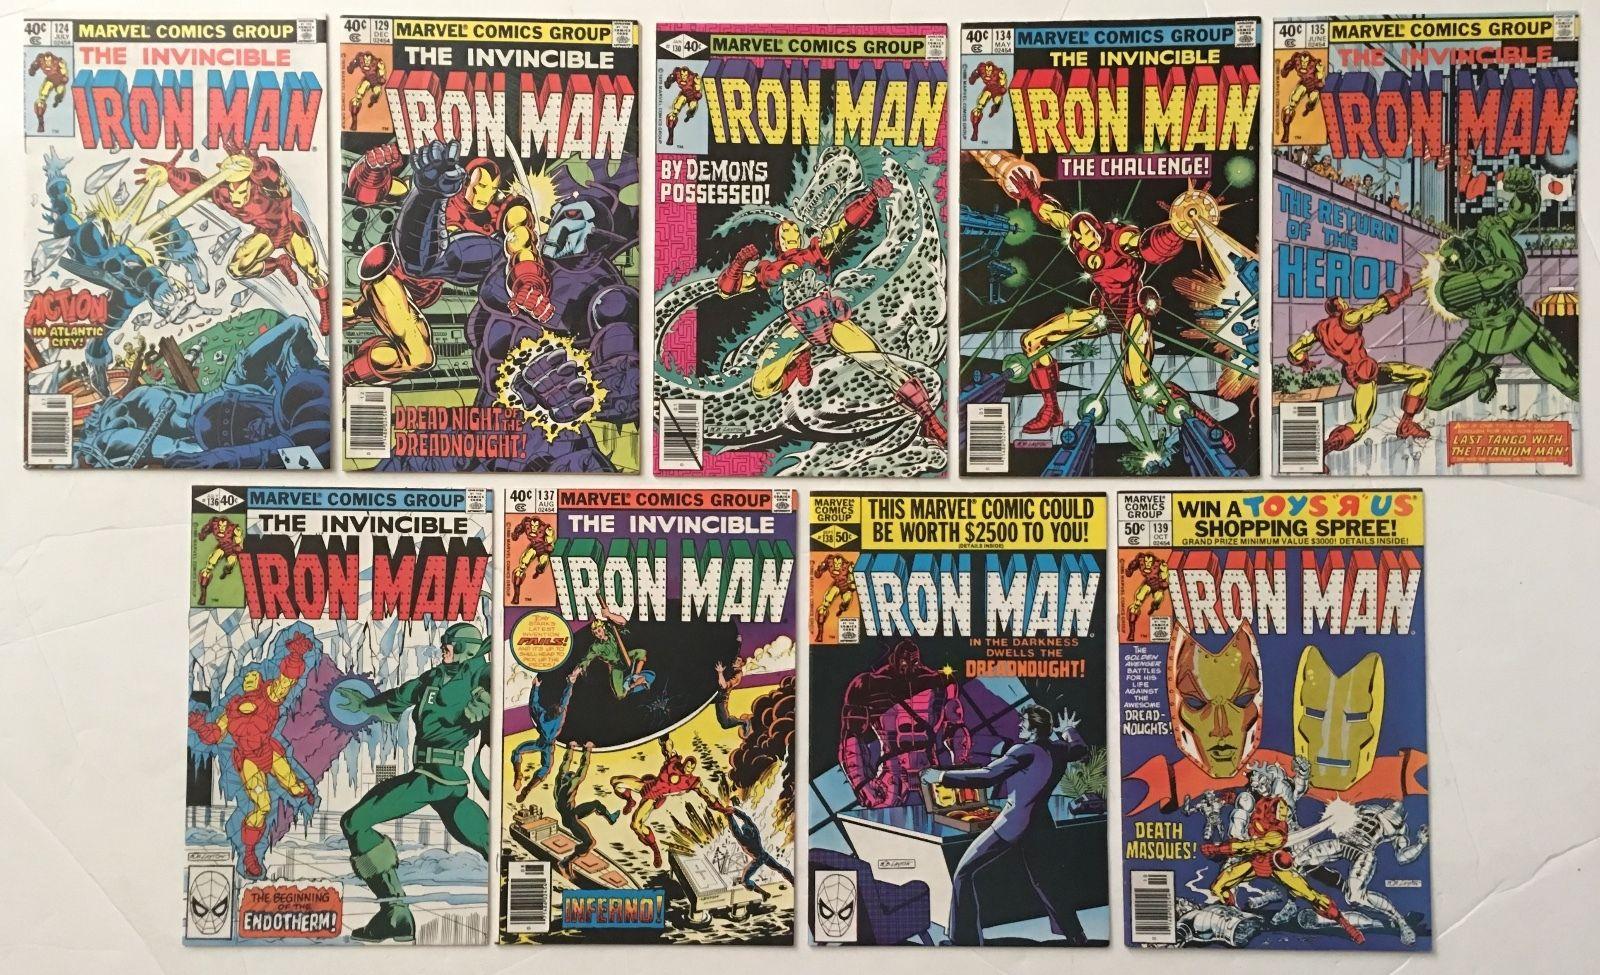 Iron Man # 124 129 130 134 135 136 137 138 139 Lot of 9 Bronze Age Marvel Comics